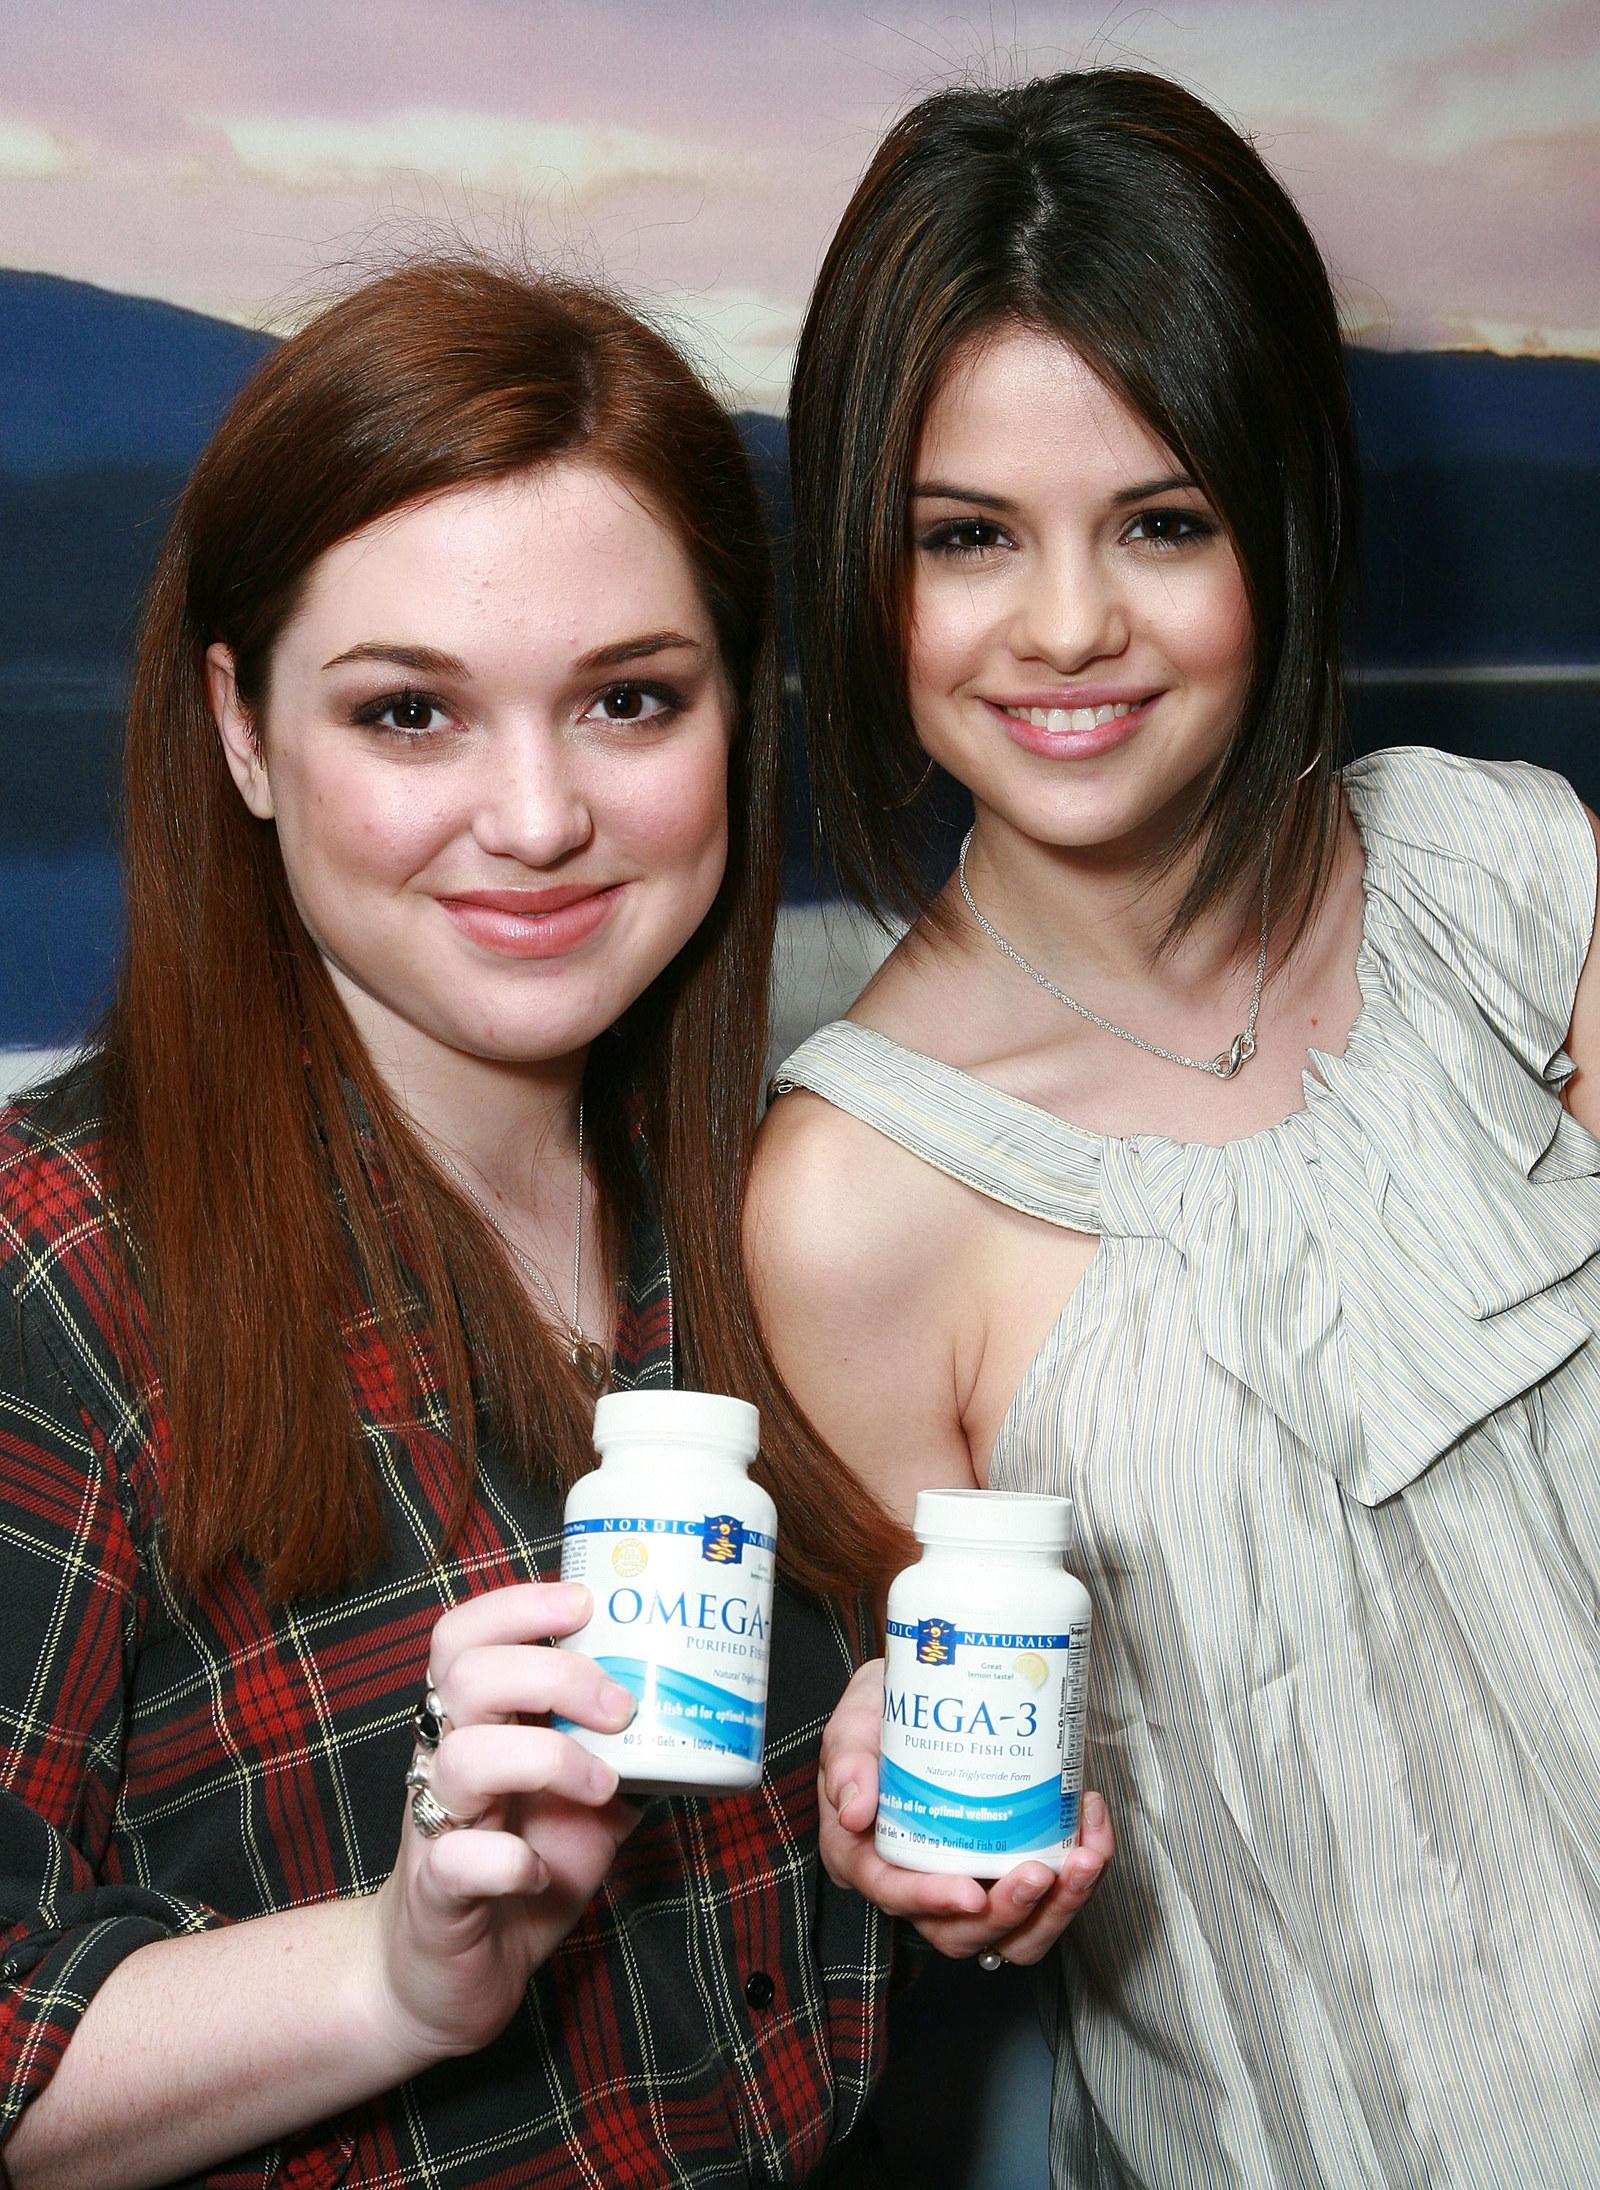 Selena Gomez and some Omega-3 pills.